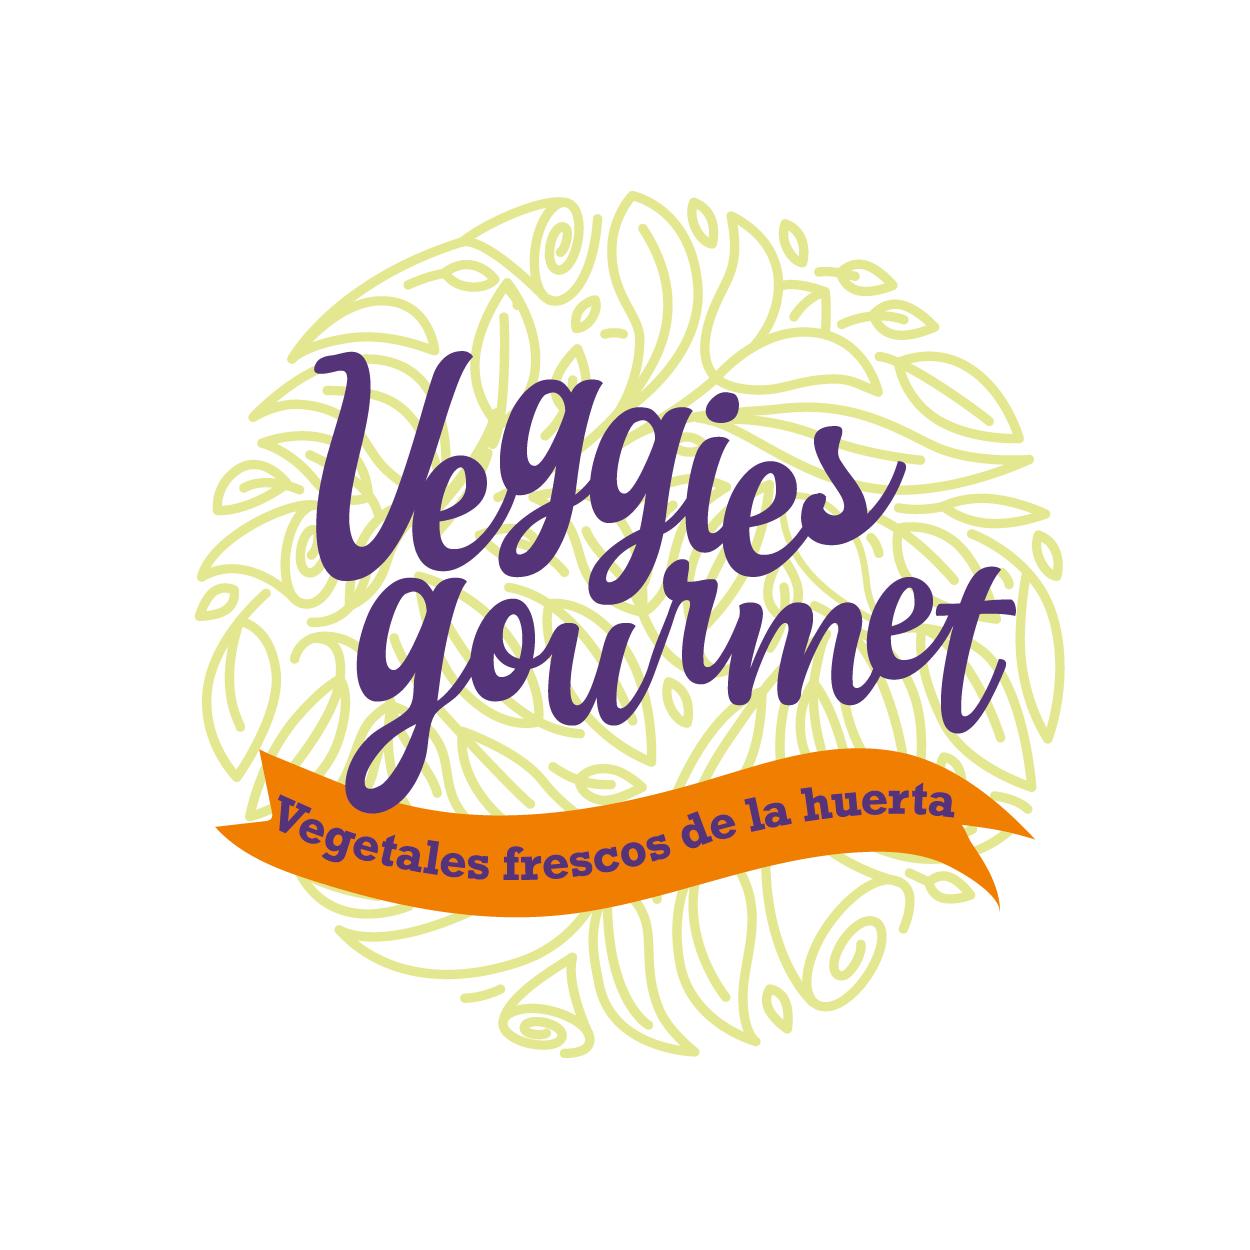 Productos Veggies Gourmet SAS